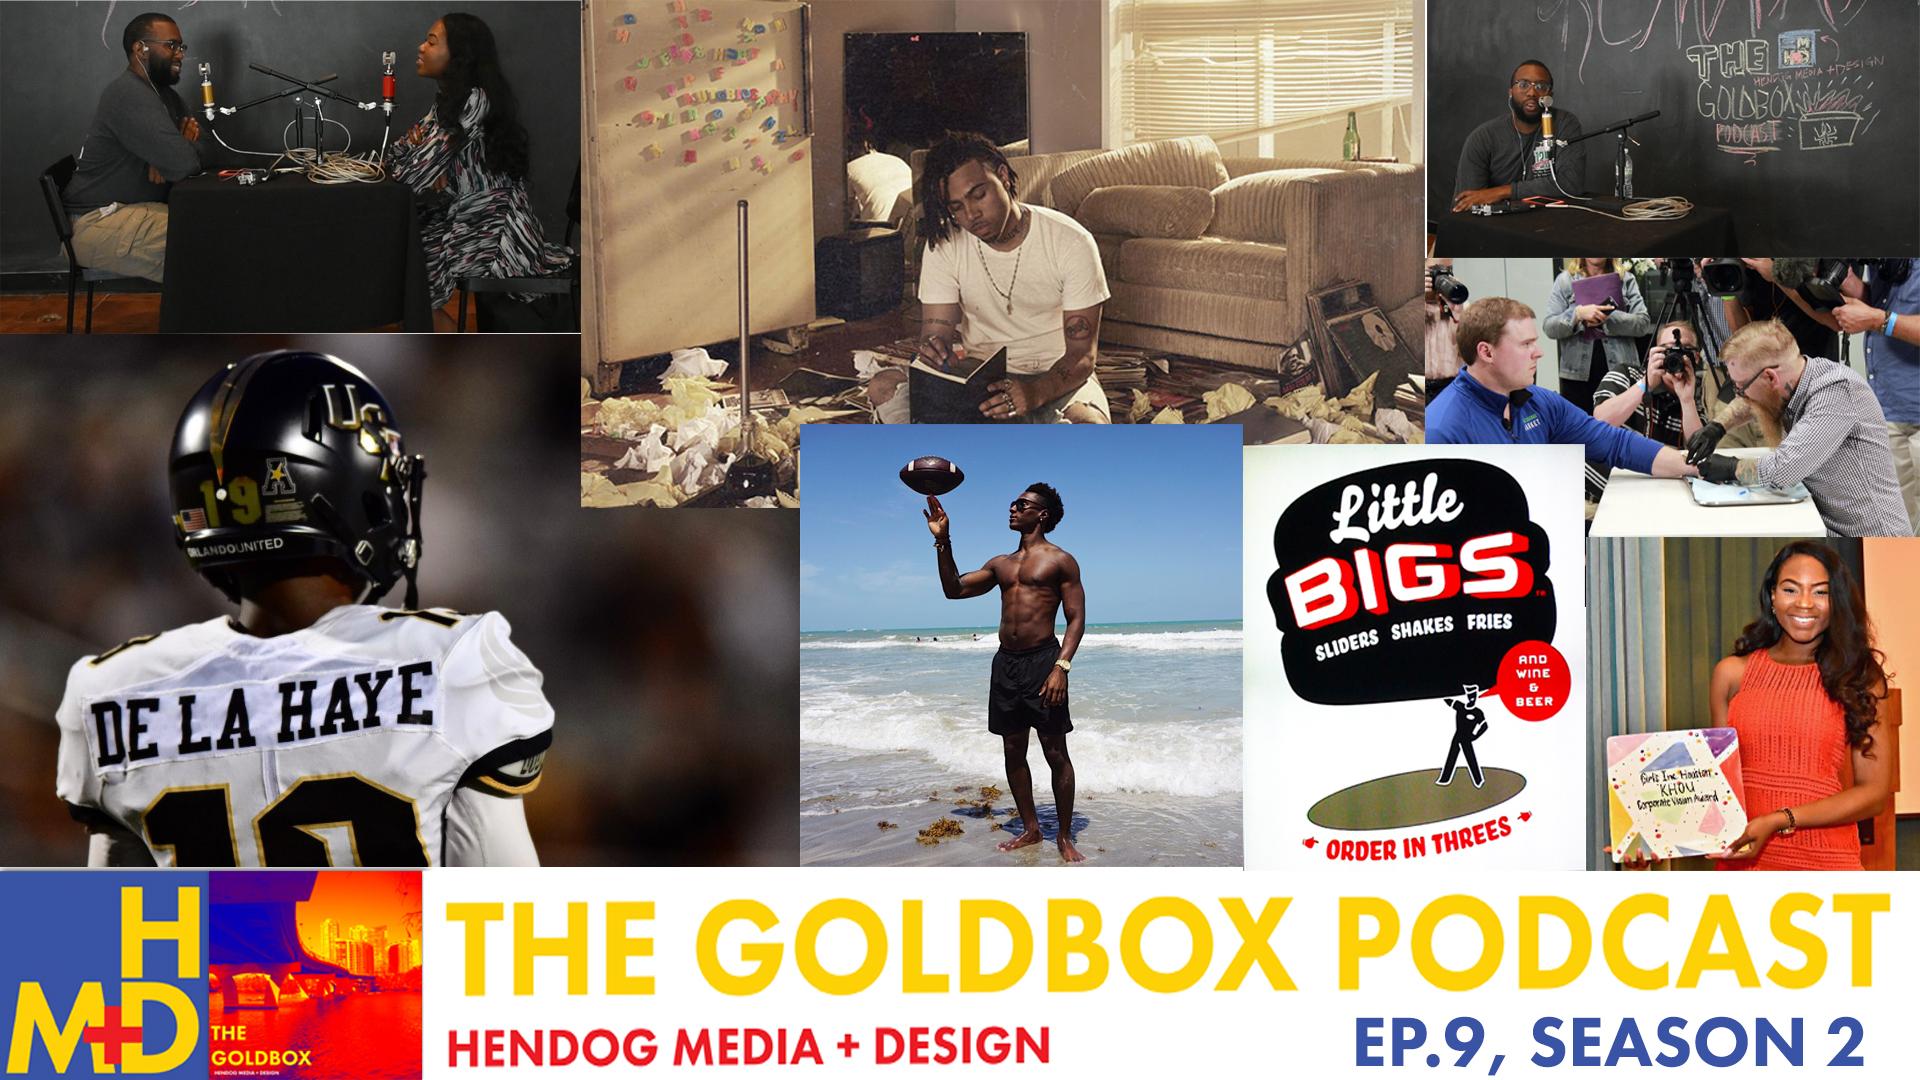 HDMD THE GOLDBOX Podcast Thumbnail v 2.0-9.jpg